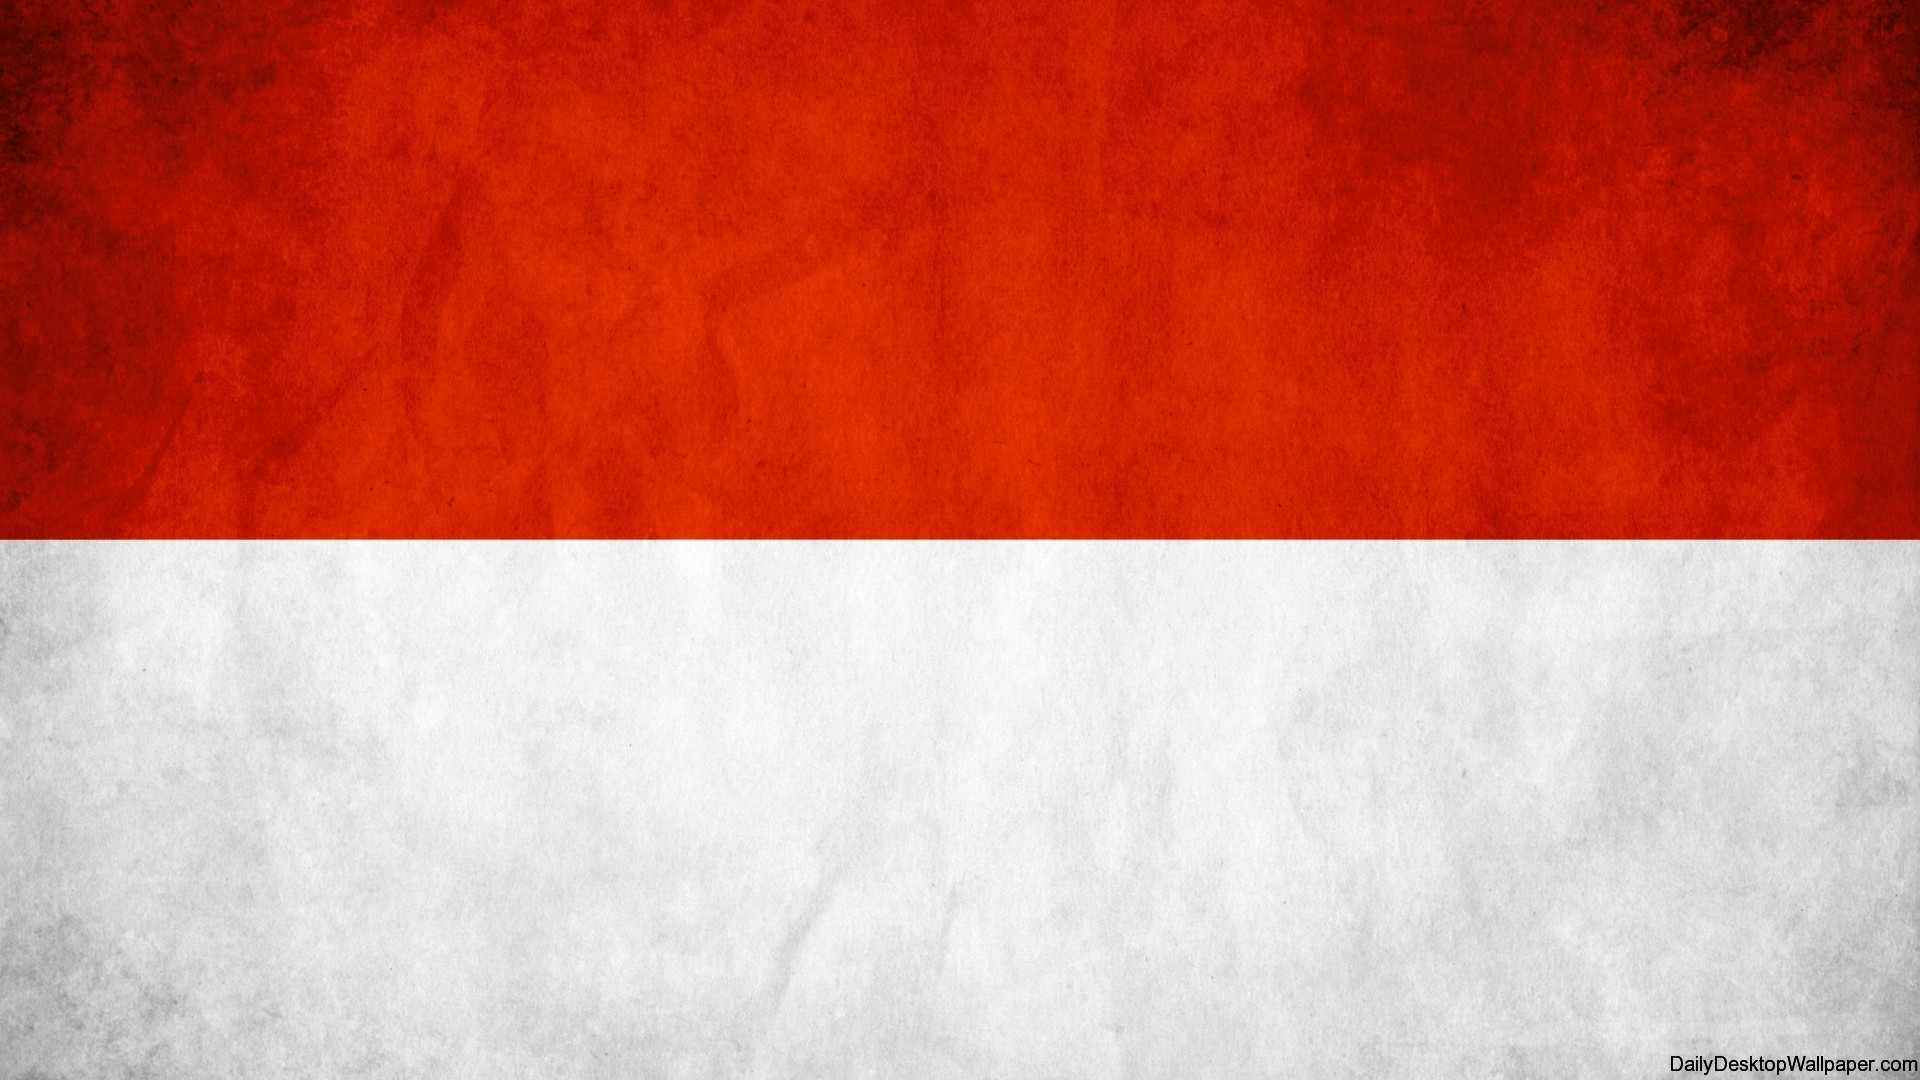 Car Wallpaper Windows 7 Indonesia Flag Wallpaper Hd Wallpapers